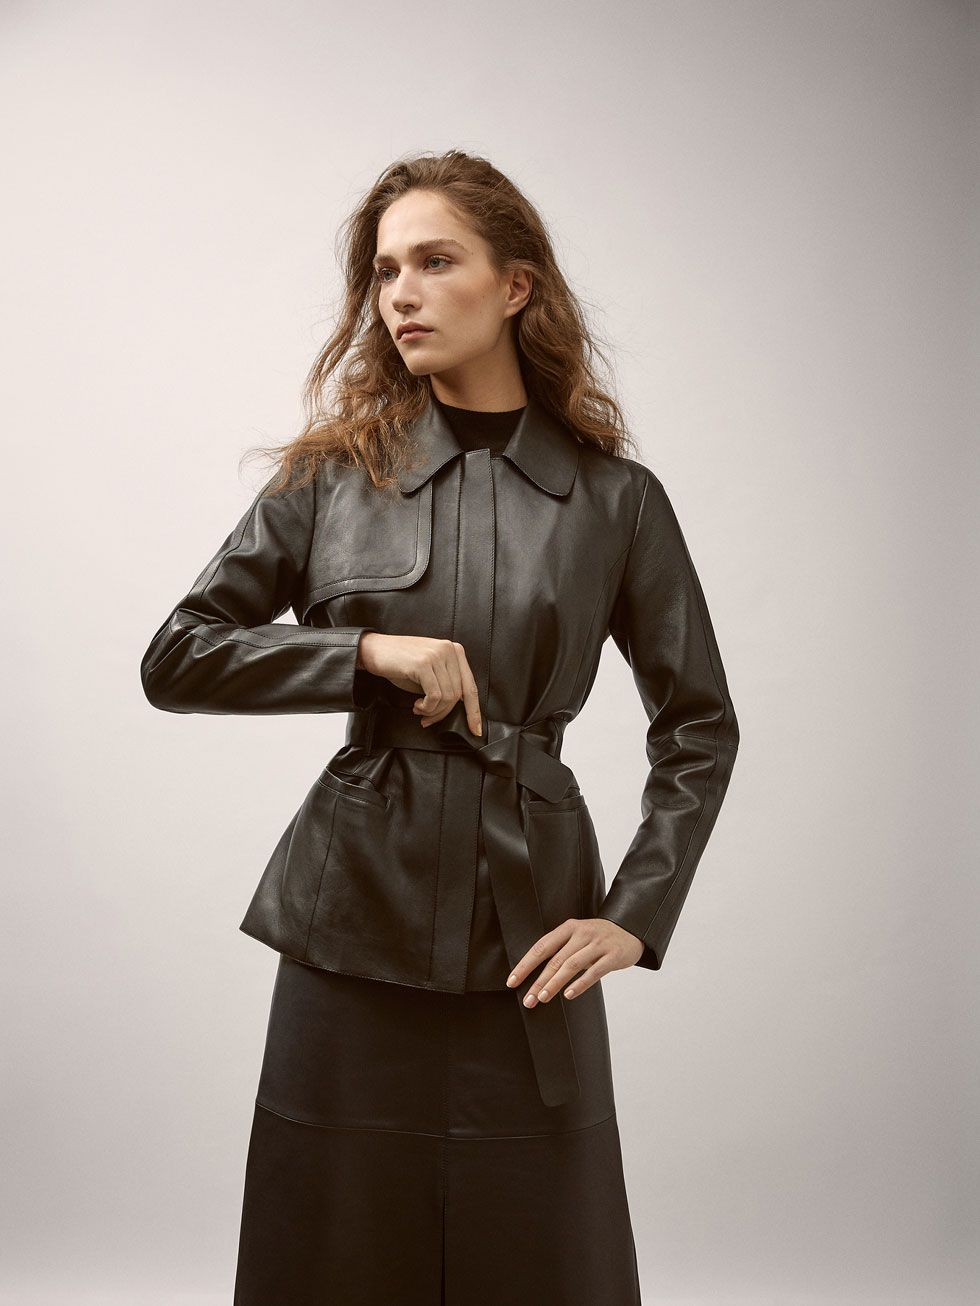 Fall Winter 2017 Women S Nappa Jacket With Belt Detail At Massimo Dutti For 249 Effortless Elegance Jackets Coats Jackets Women Women